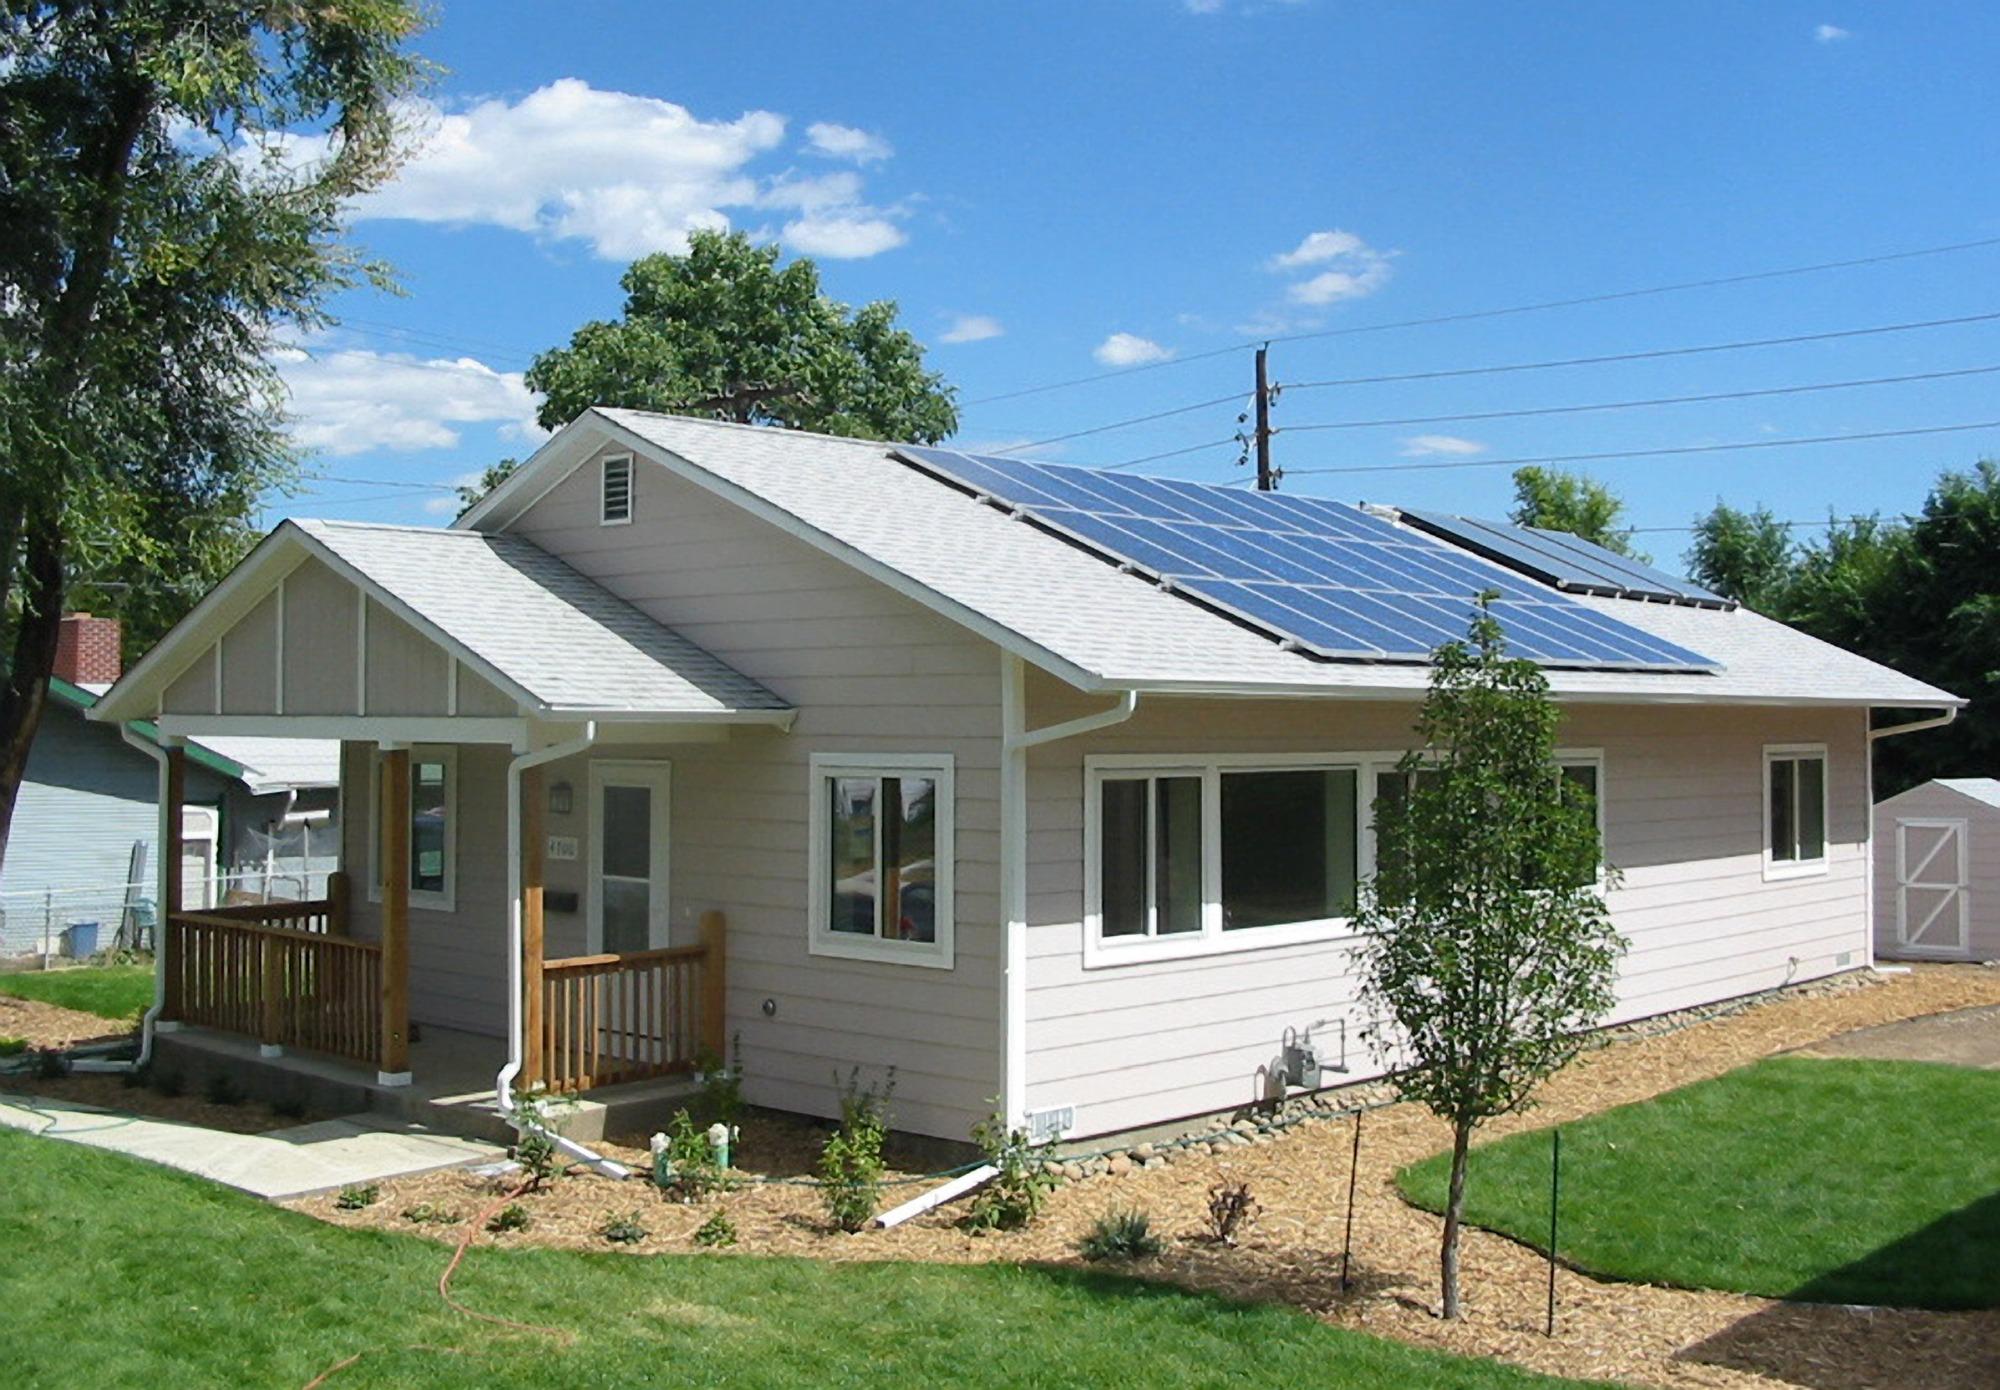 Zero energy habitat home; NREL's 2005 Habitat for Humanity house